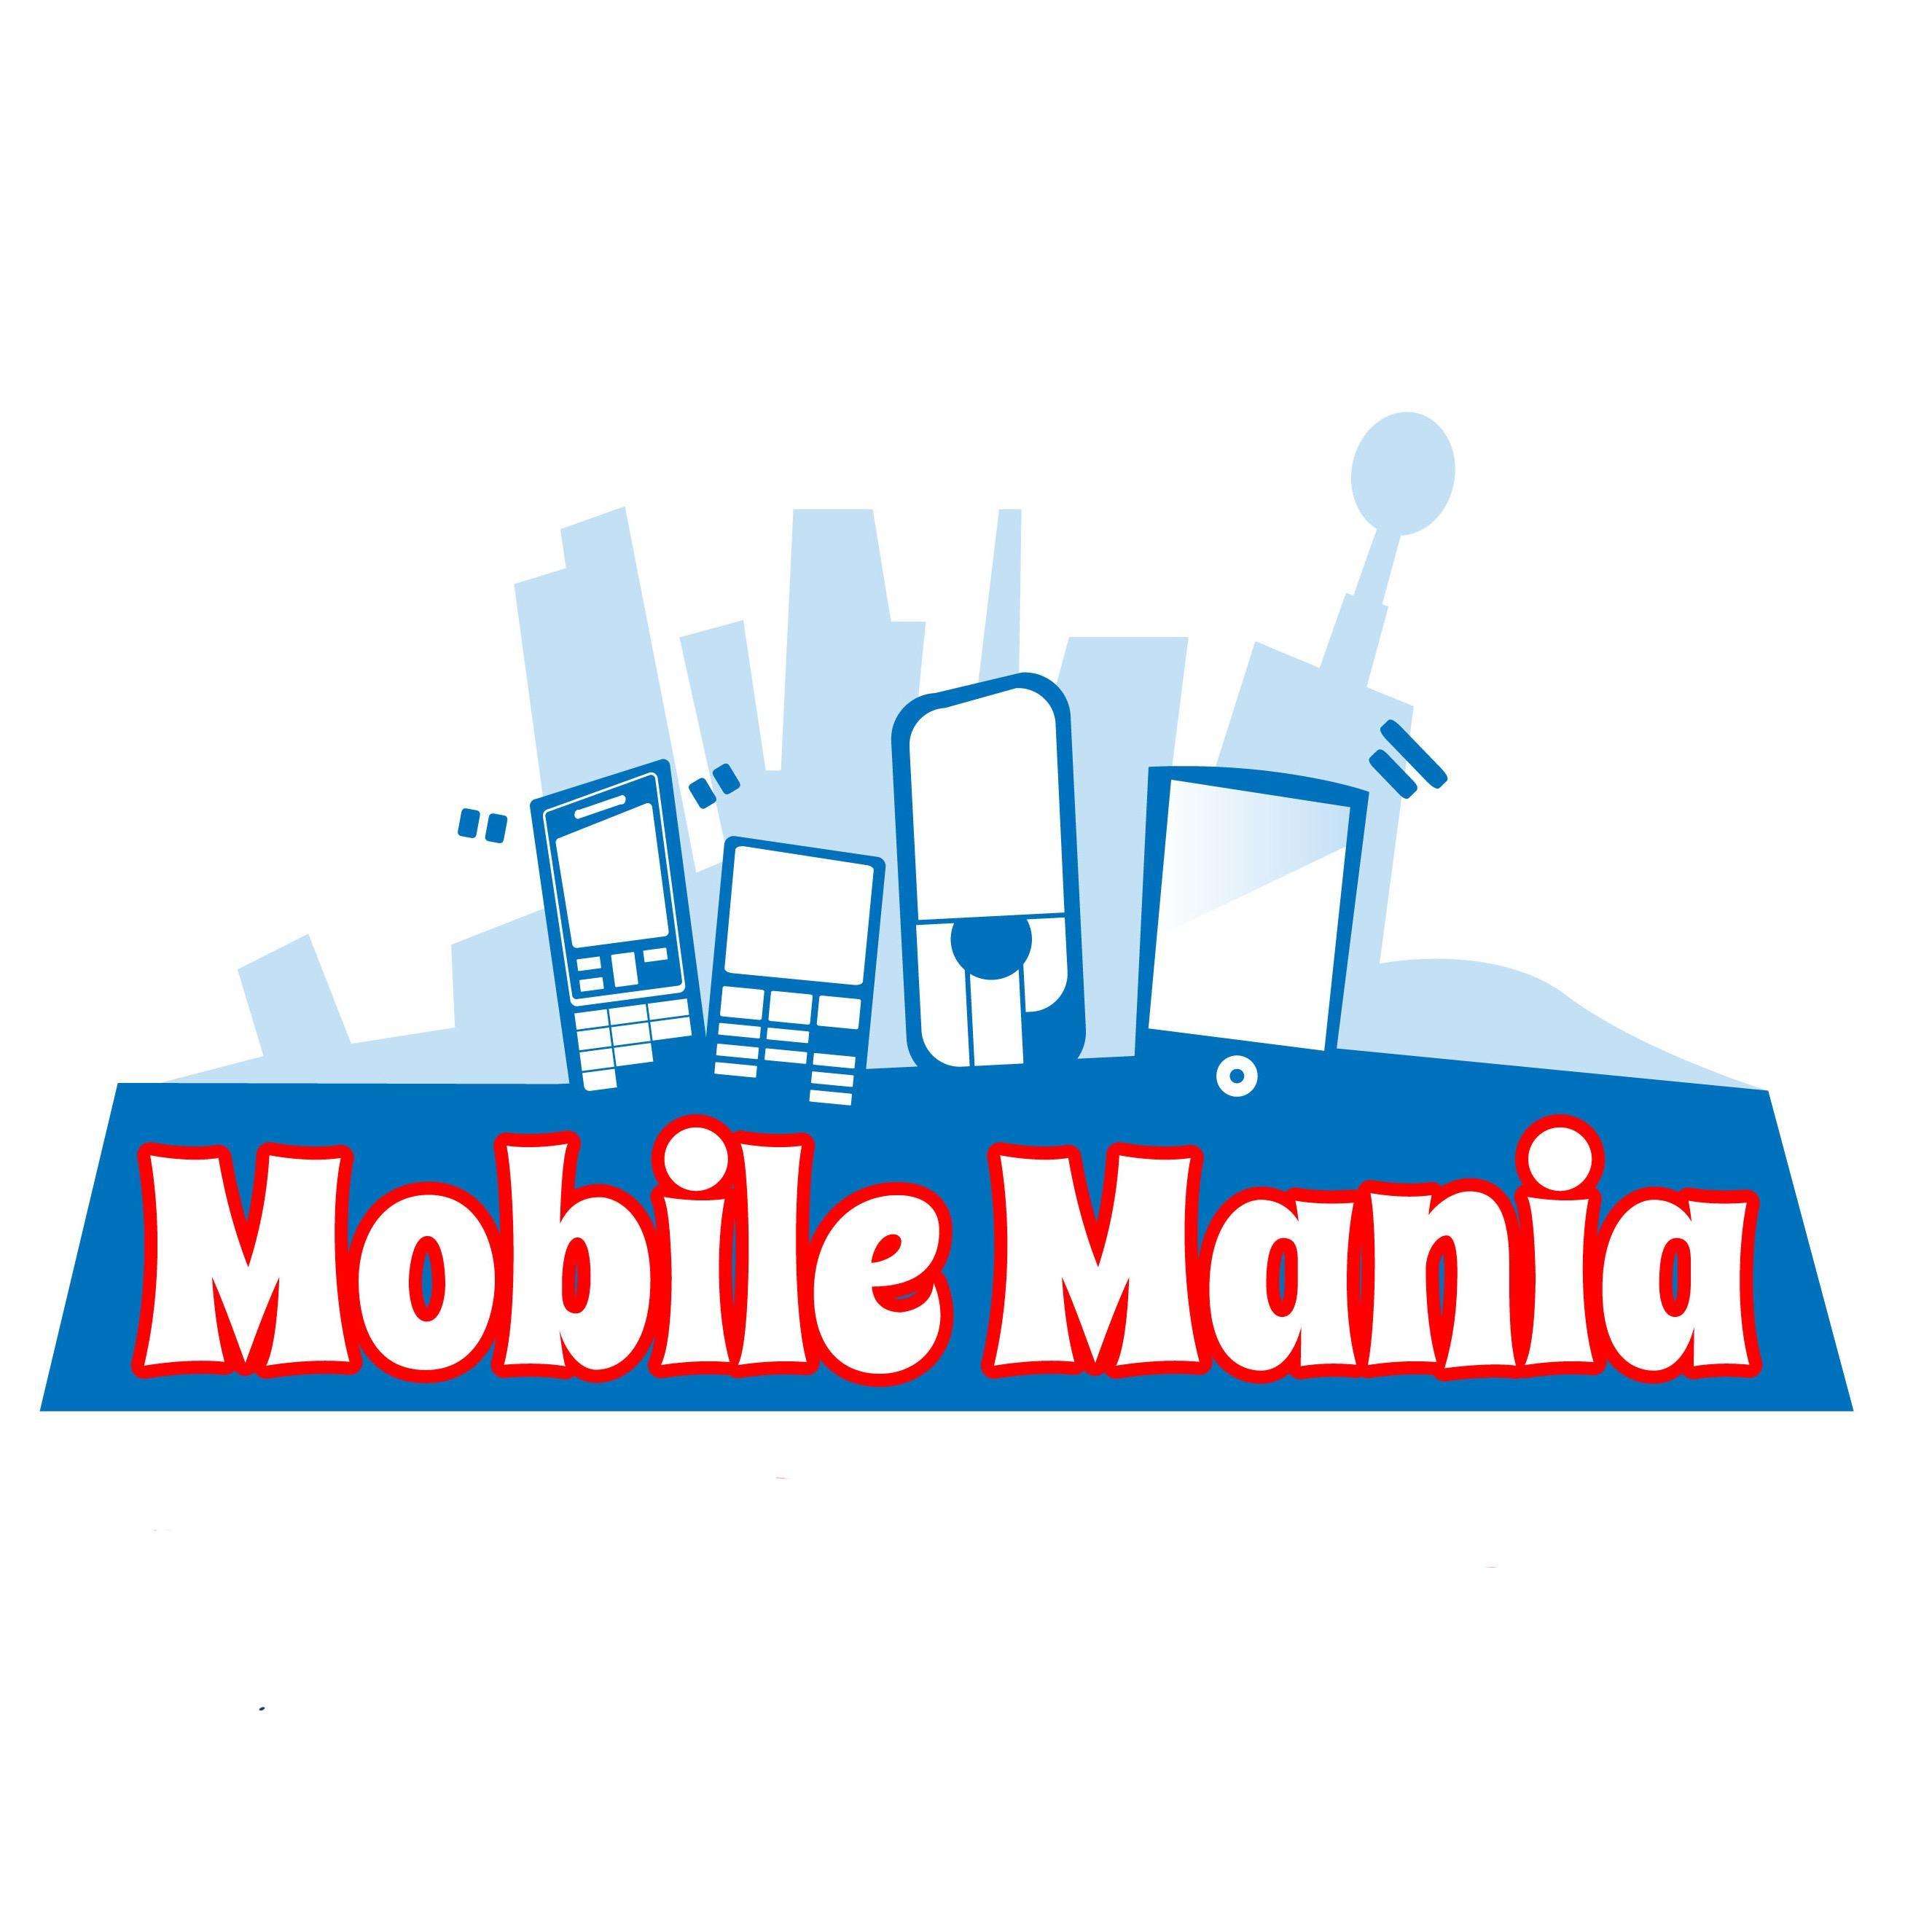 Mobile Mania Chiefland